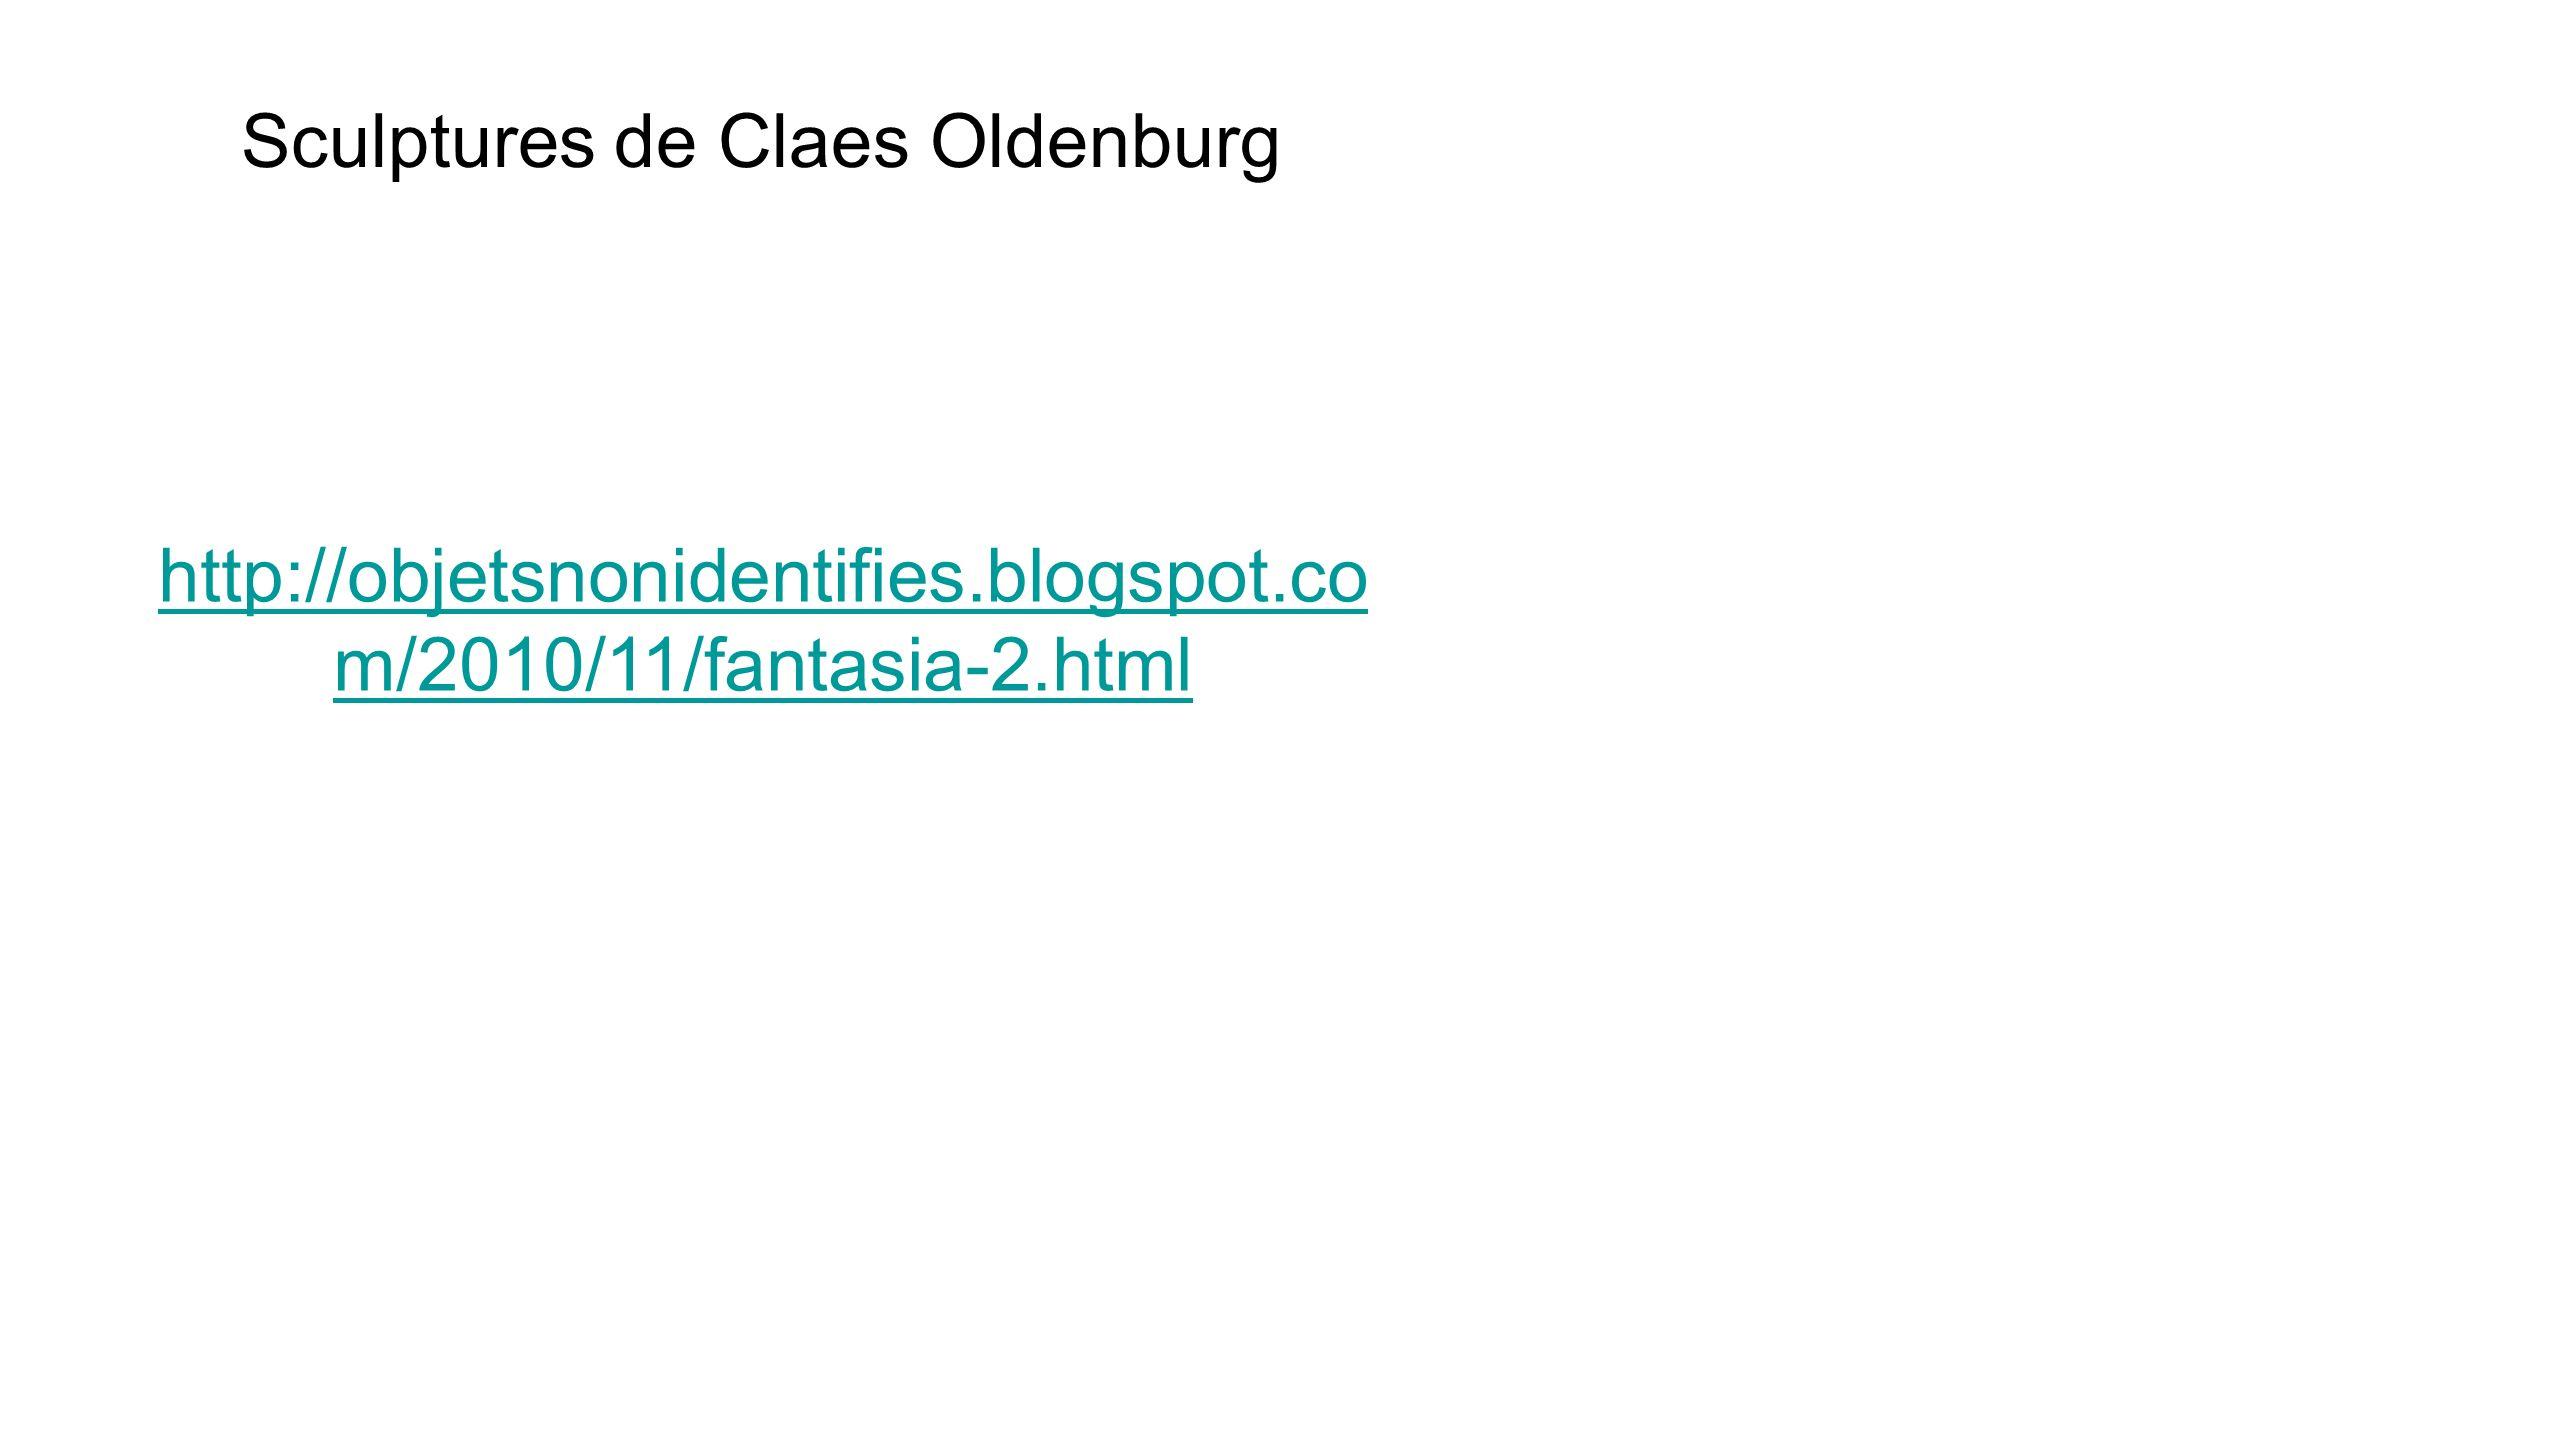 Sculptures de Claes Oldenburg http://objetsnonidentifies.blogspot.co m/2010/11/fantasia-2.html